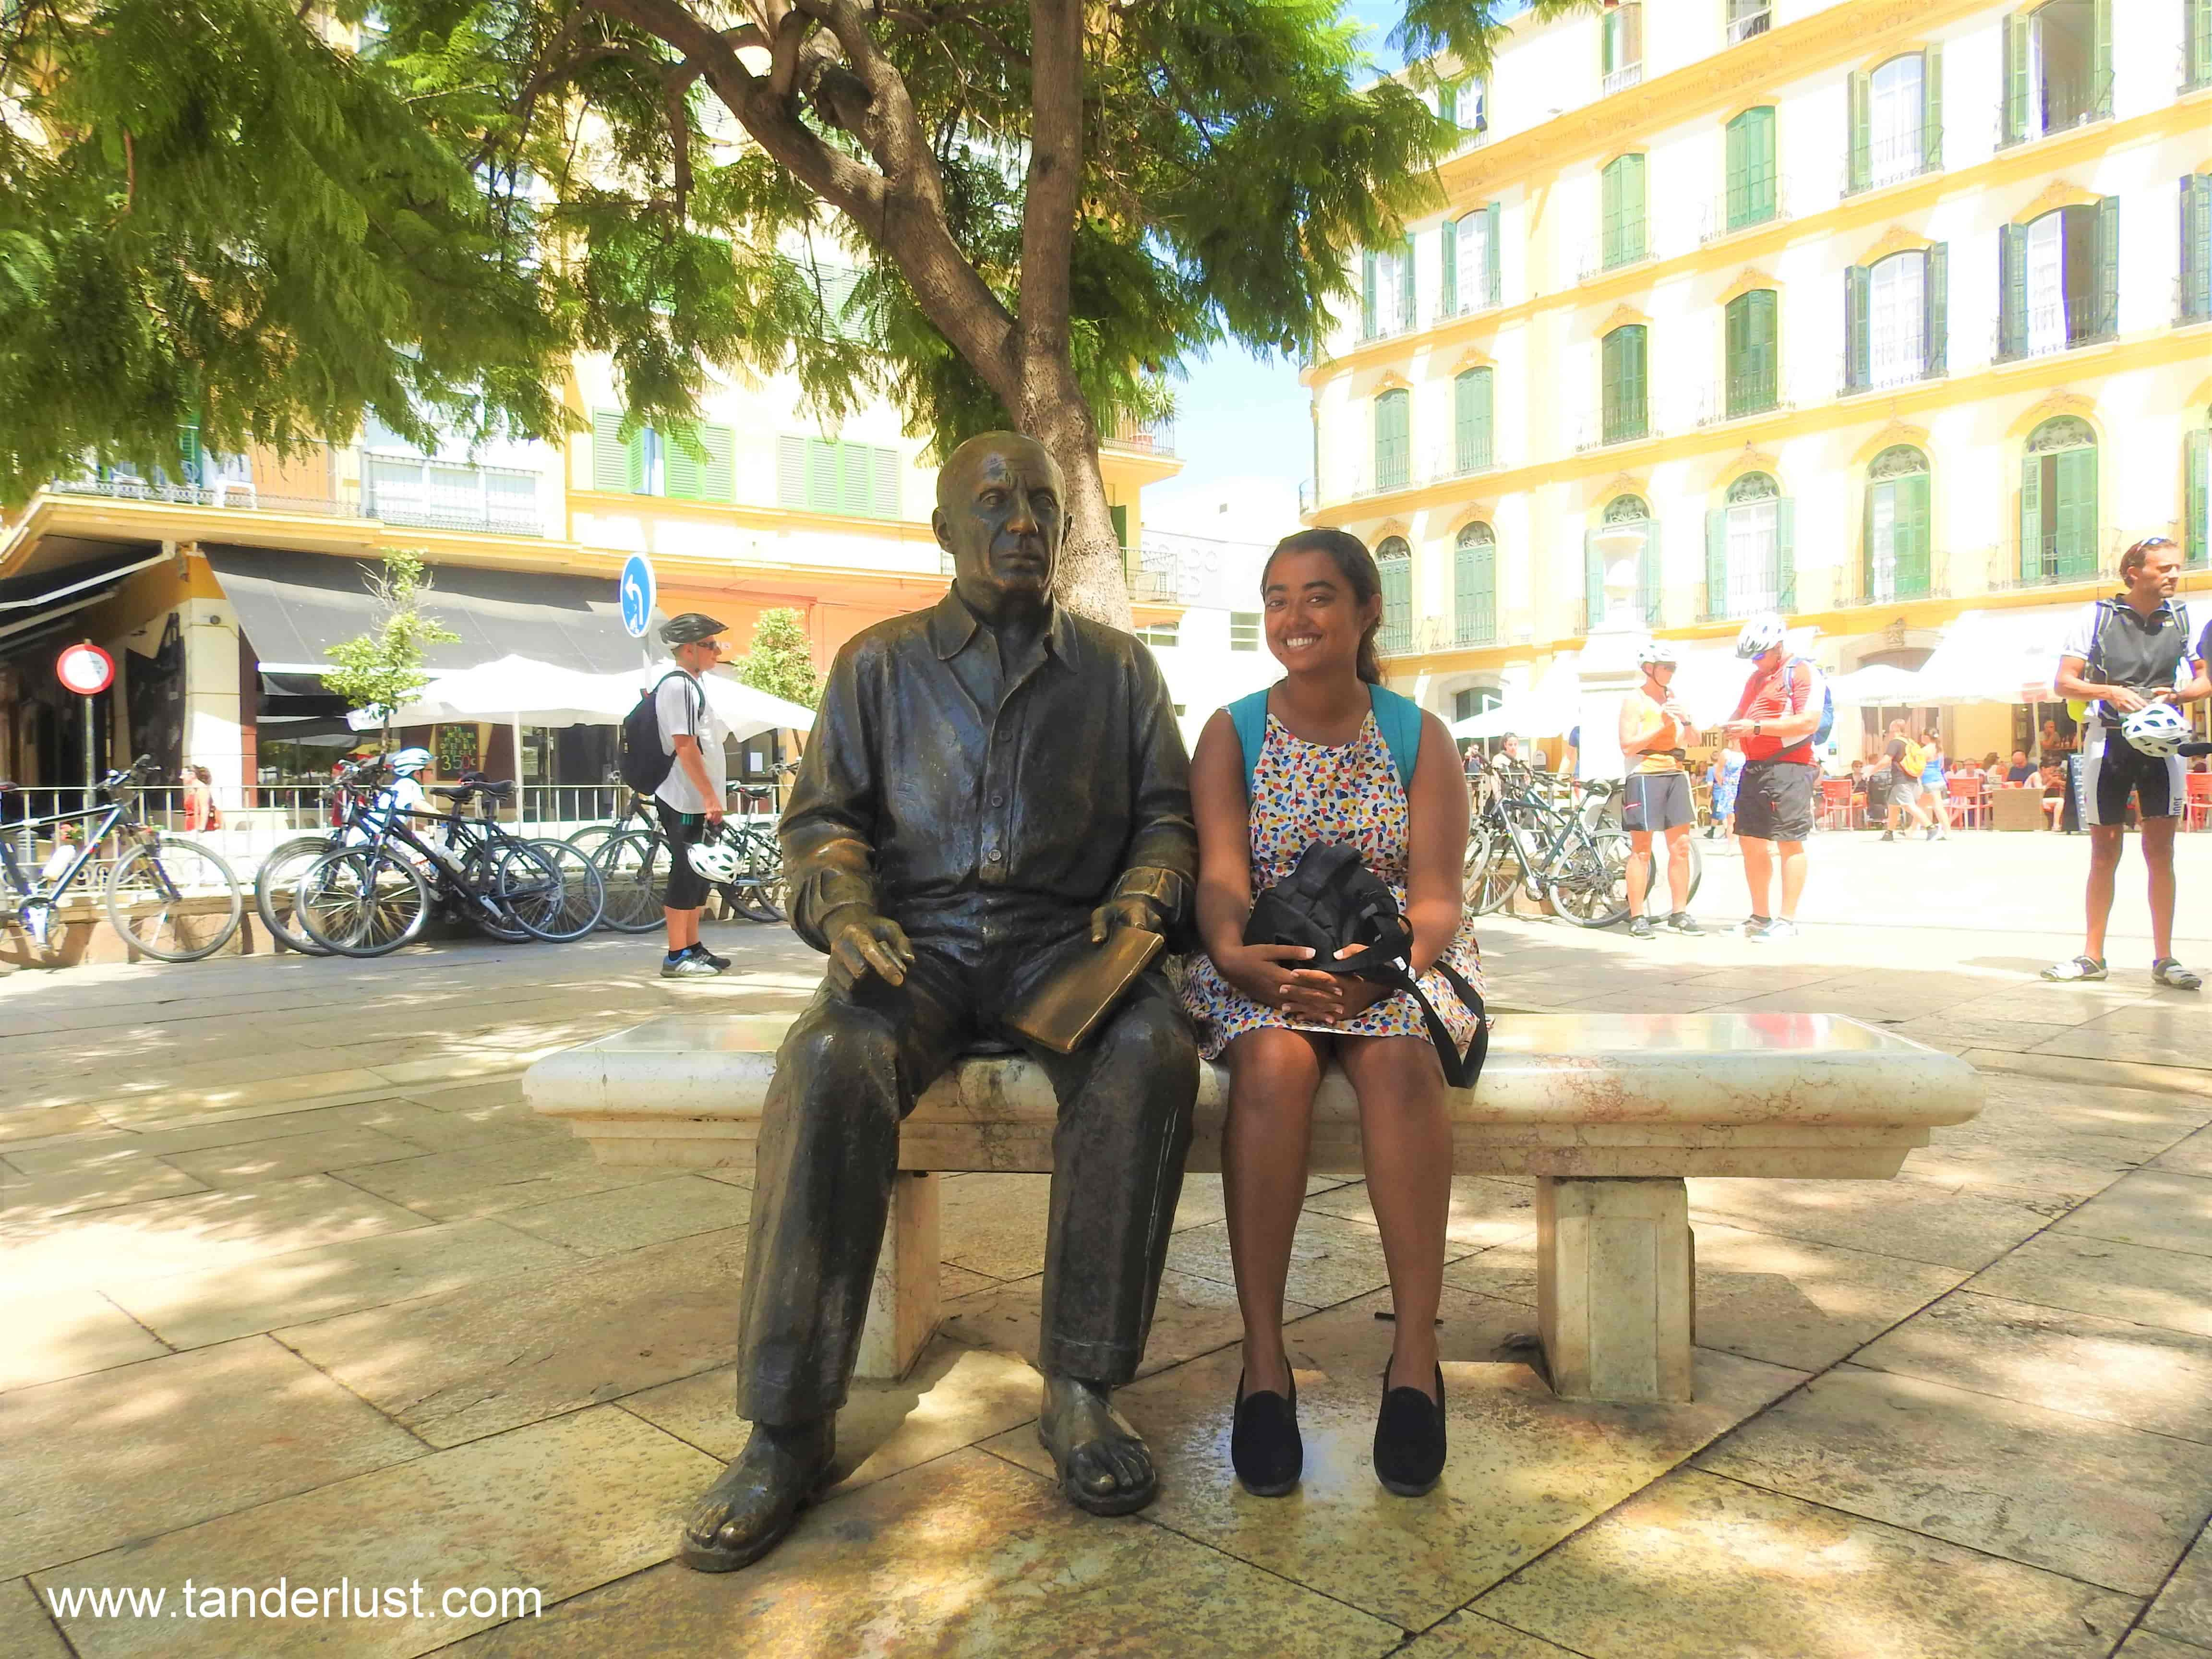 Pablo Picasso & me